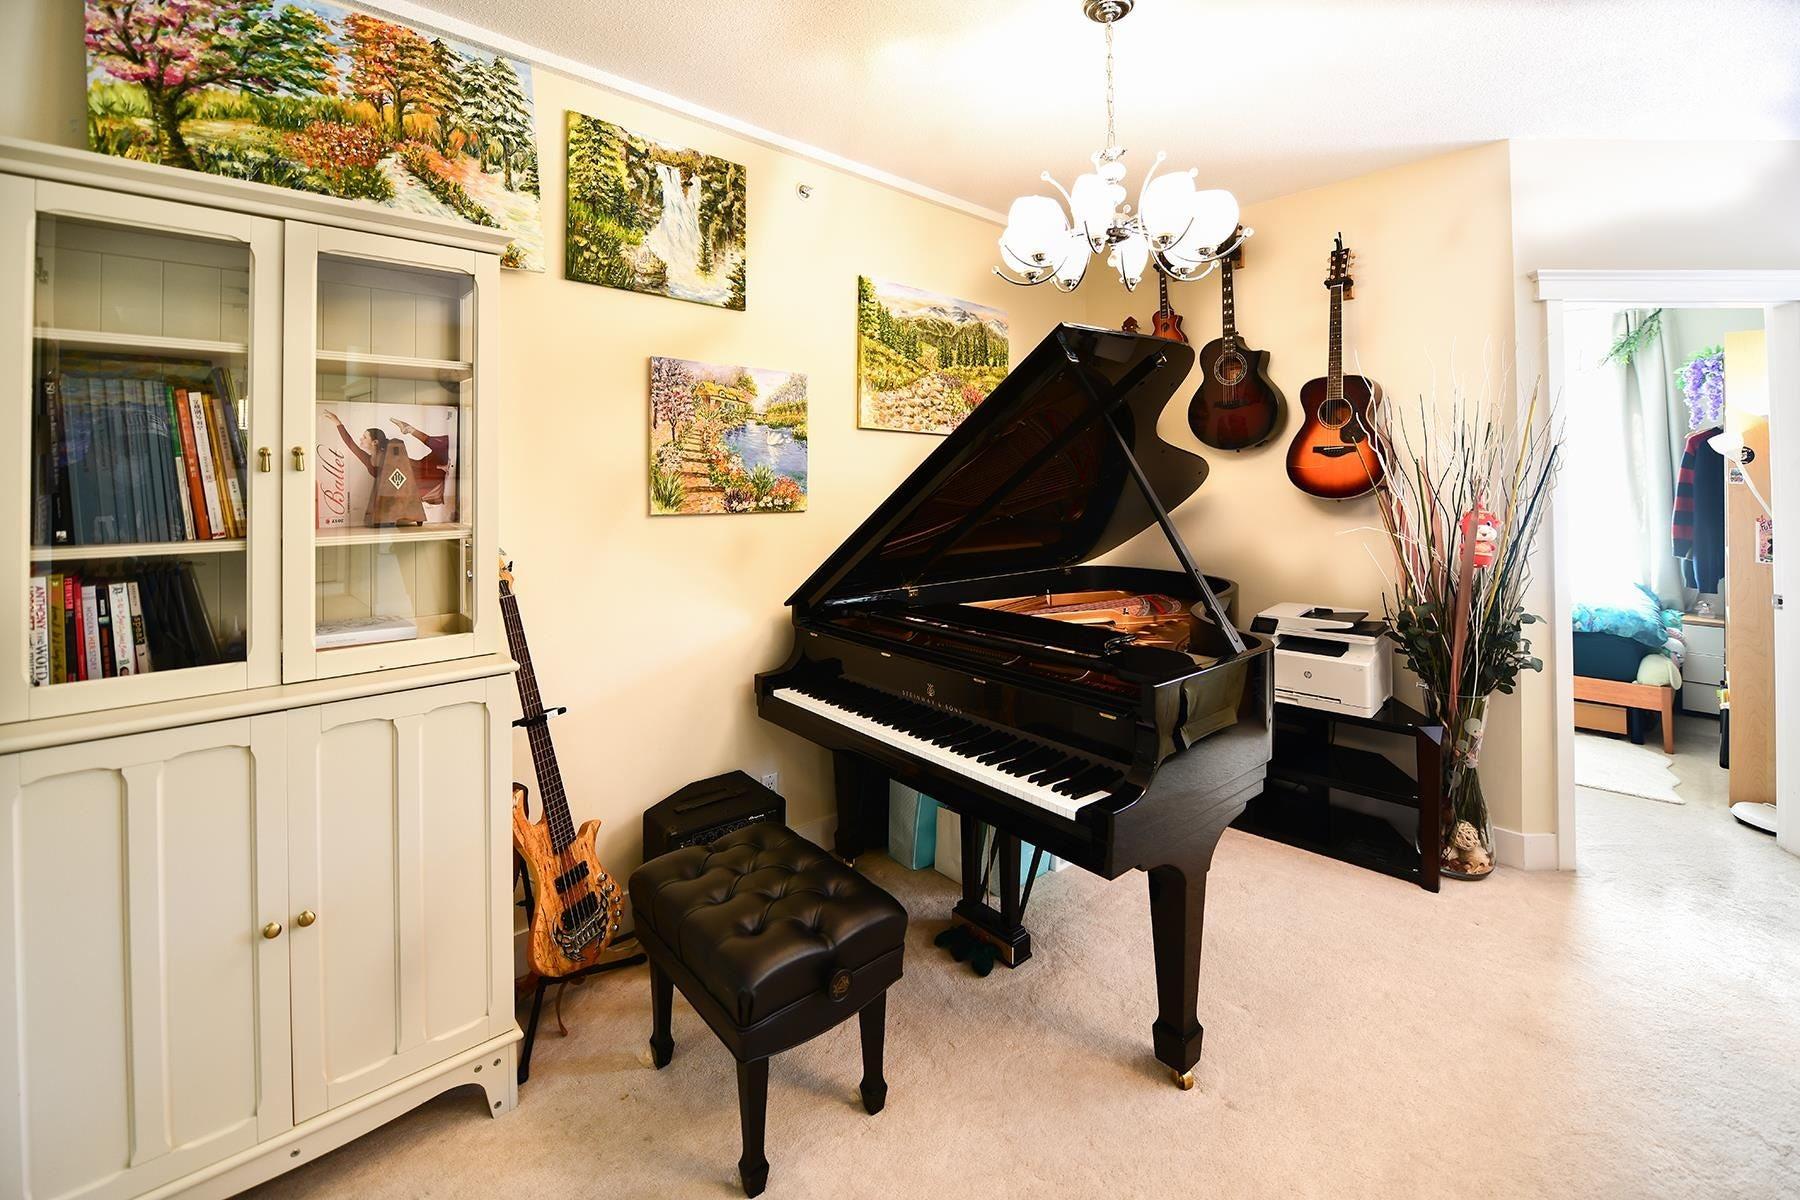 204 5790 EAST BOULEVARD - Kerrisdale Apartment/Condo for sale, 3 Bedrooms (R2604138) - #2